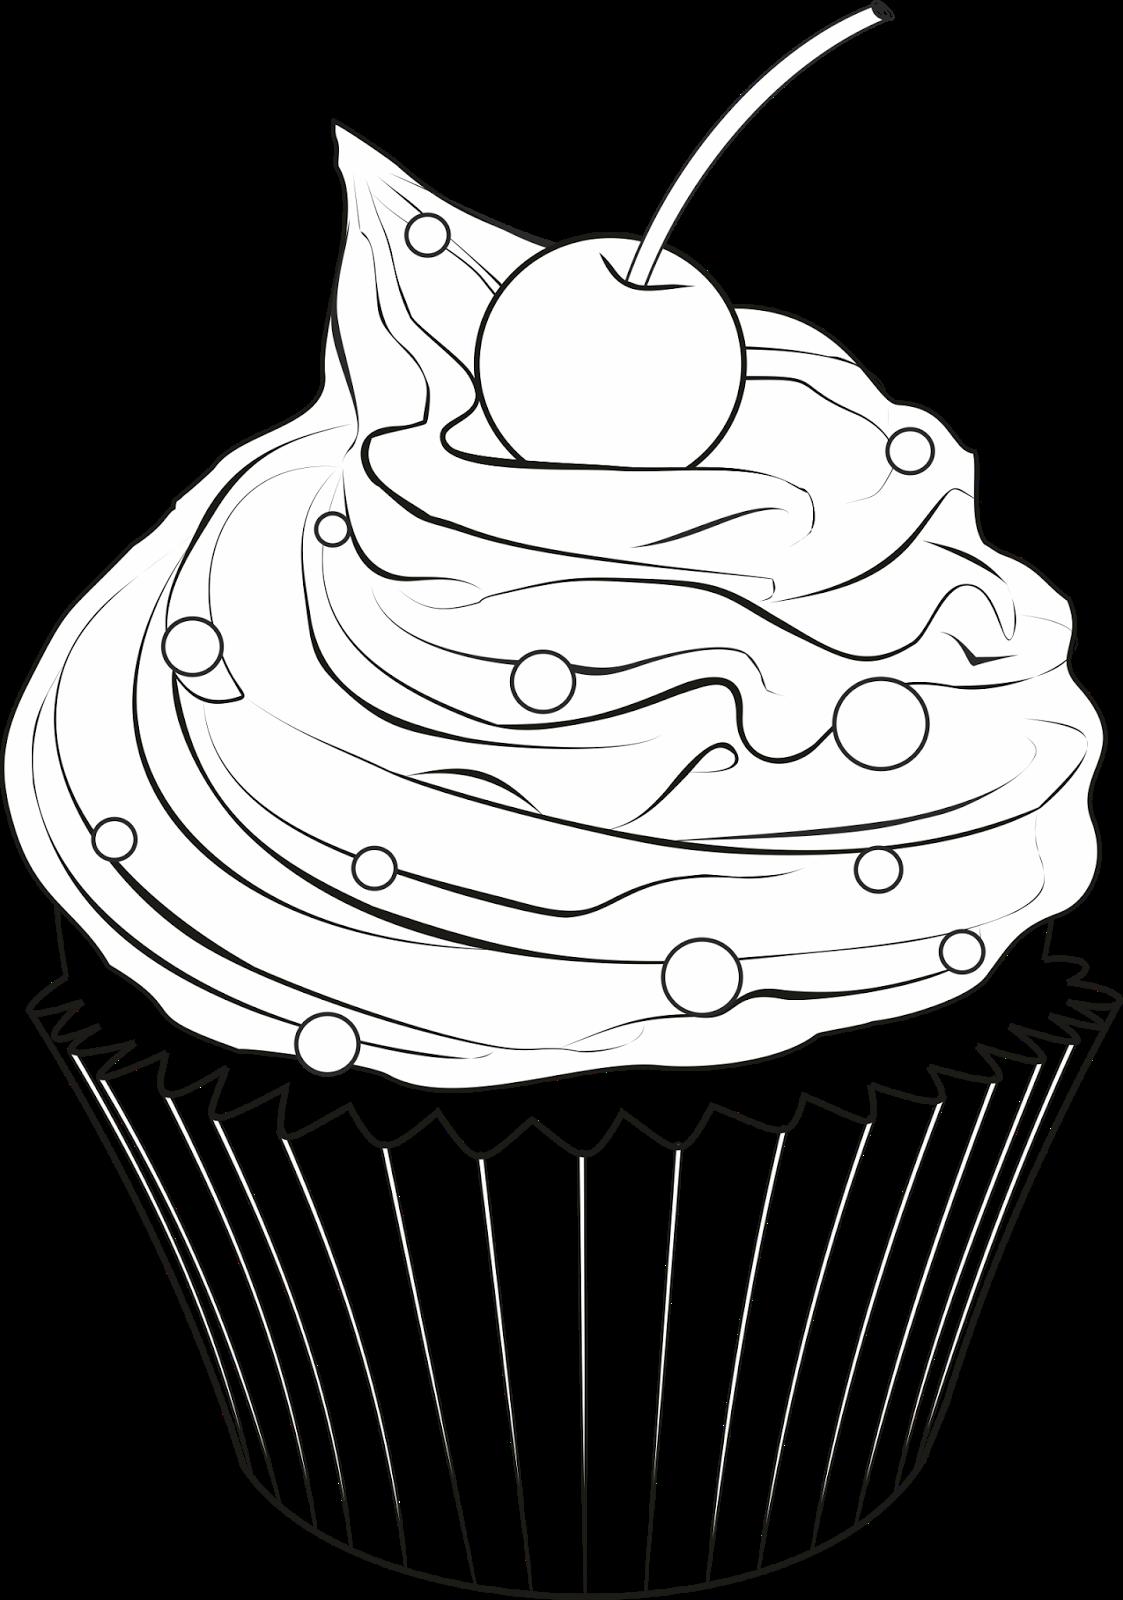 Картинка раскраска кекс